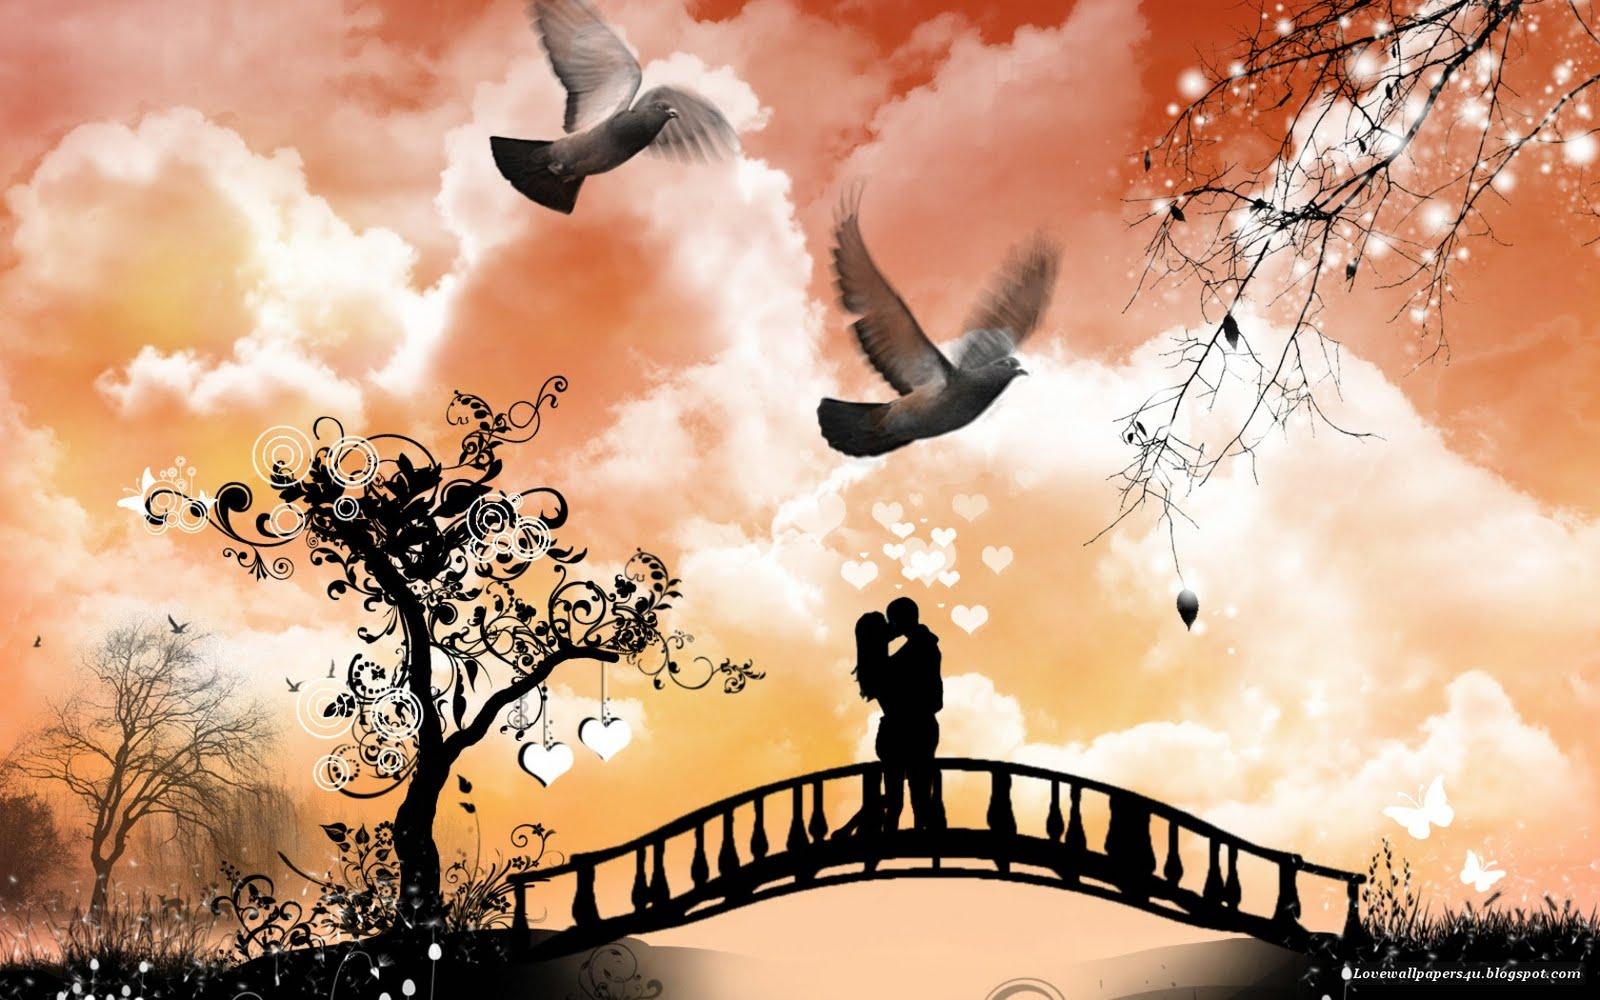 Hd wallpaper of love - Love Wallpapers Hd Love Wallpapers Hd Love Wallpapers Hd Love